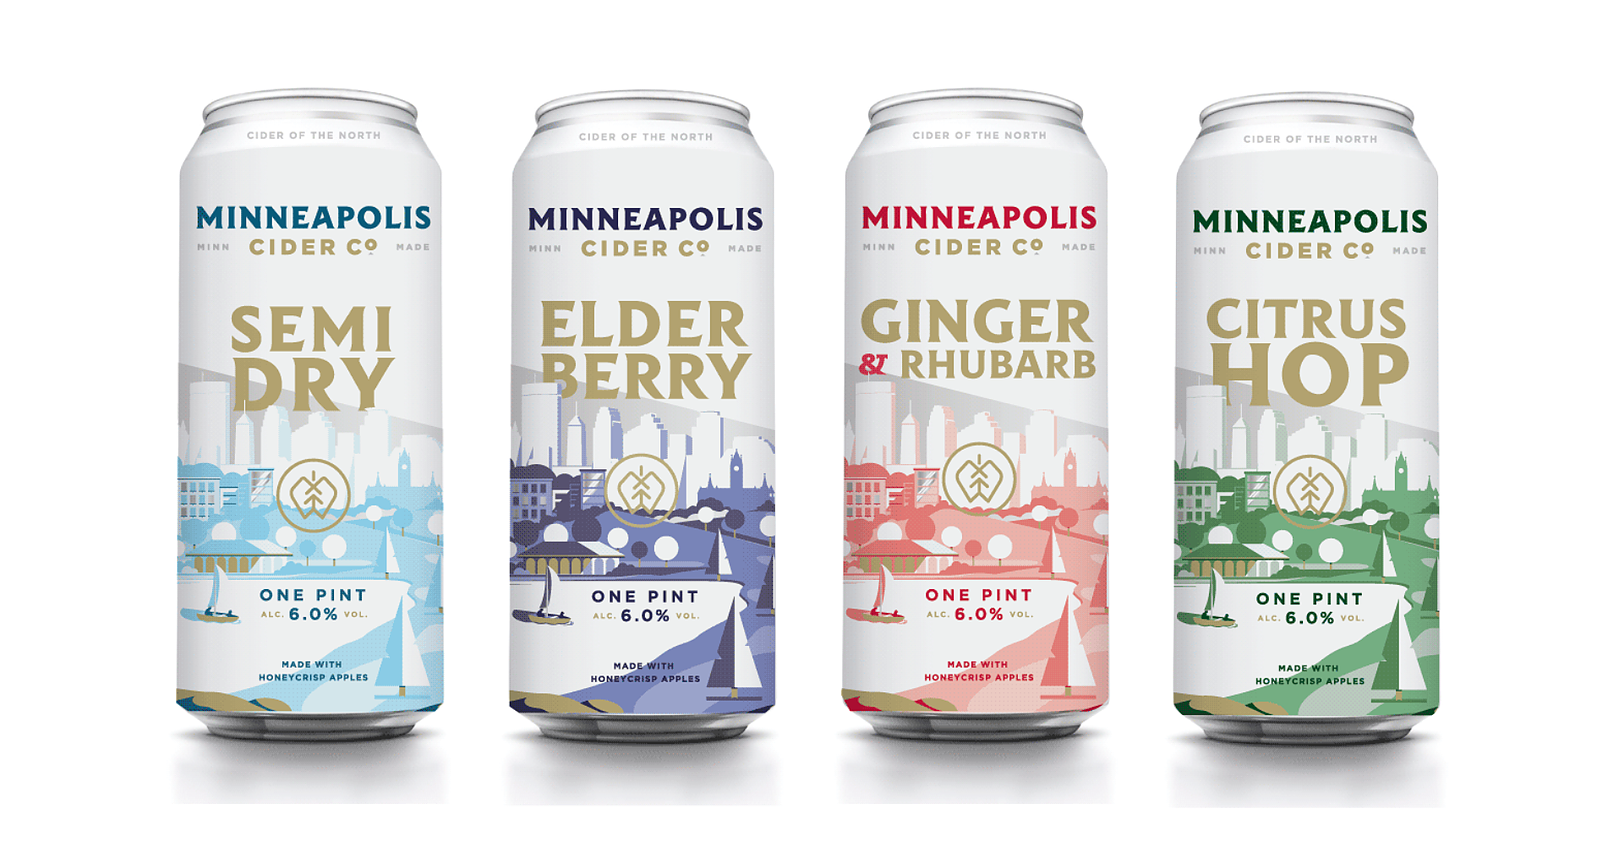 minneapolis cider co can design concept